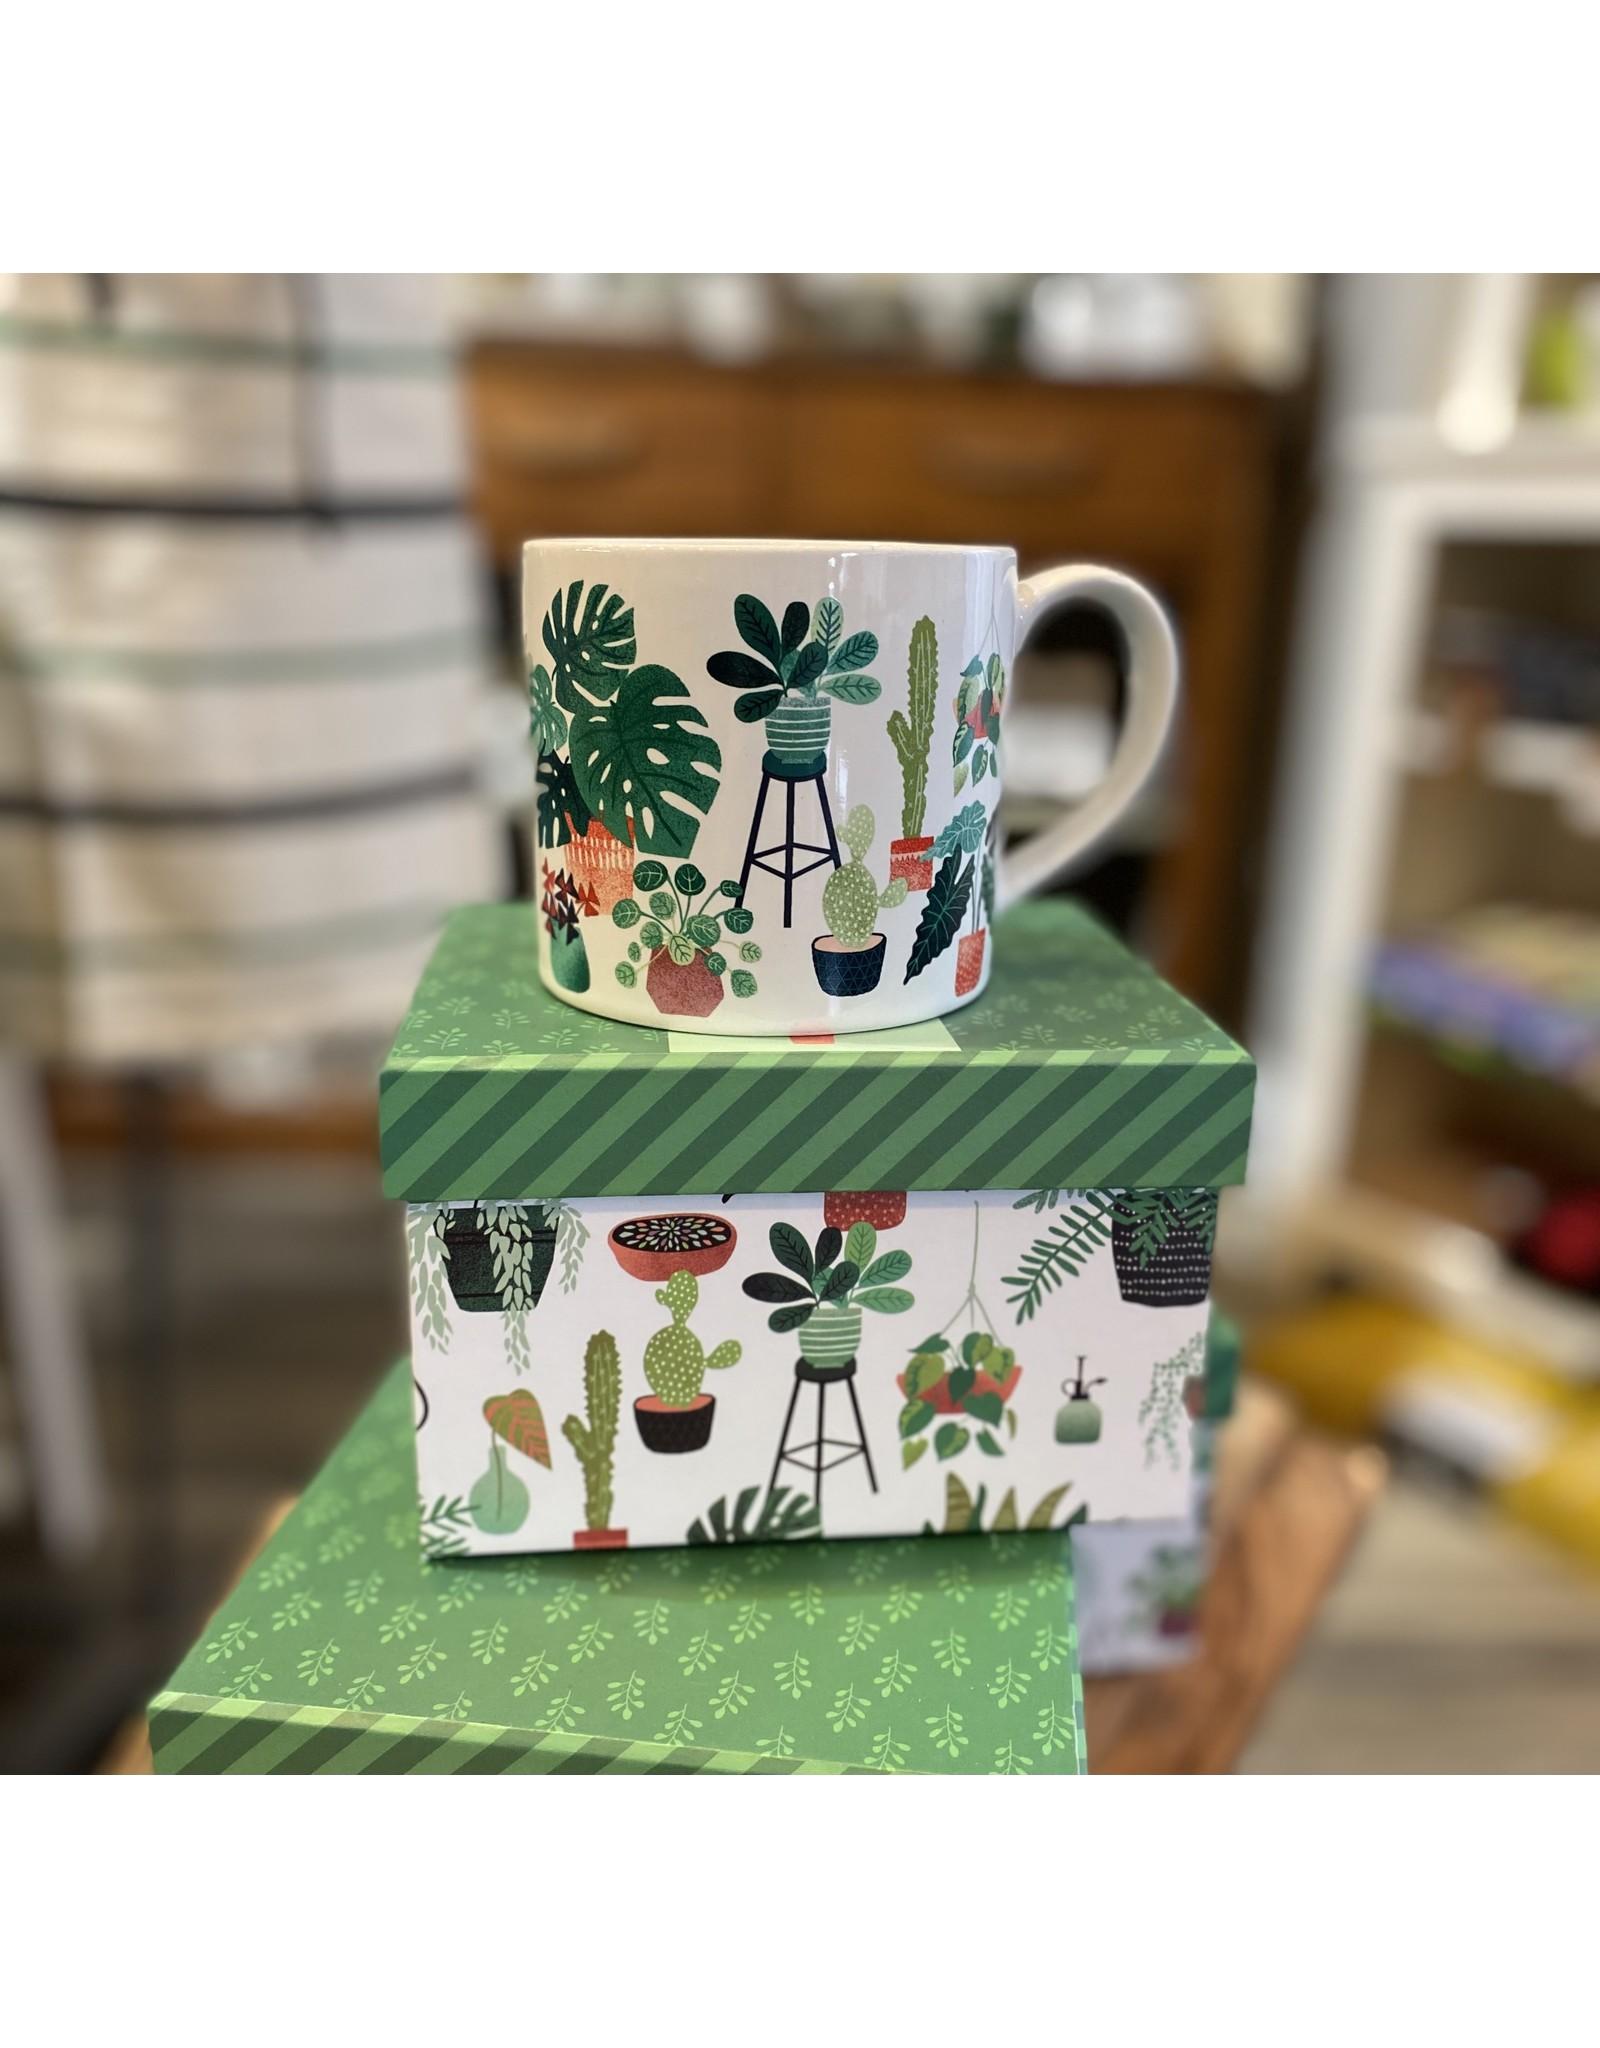 Let It Grow Mug in a Box